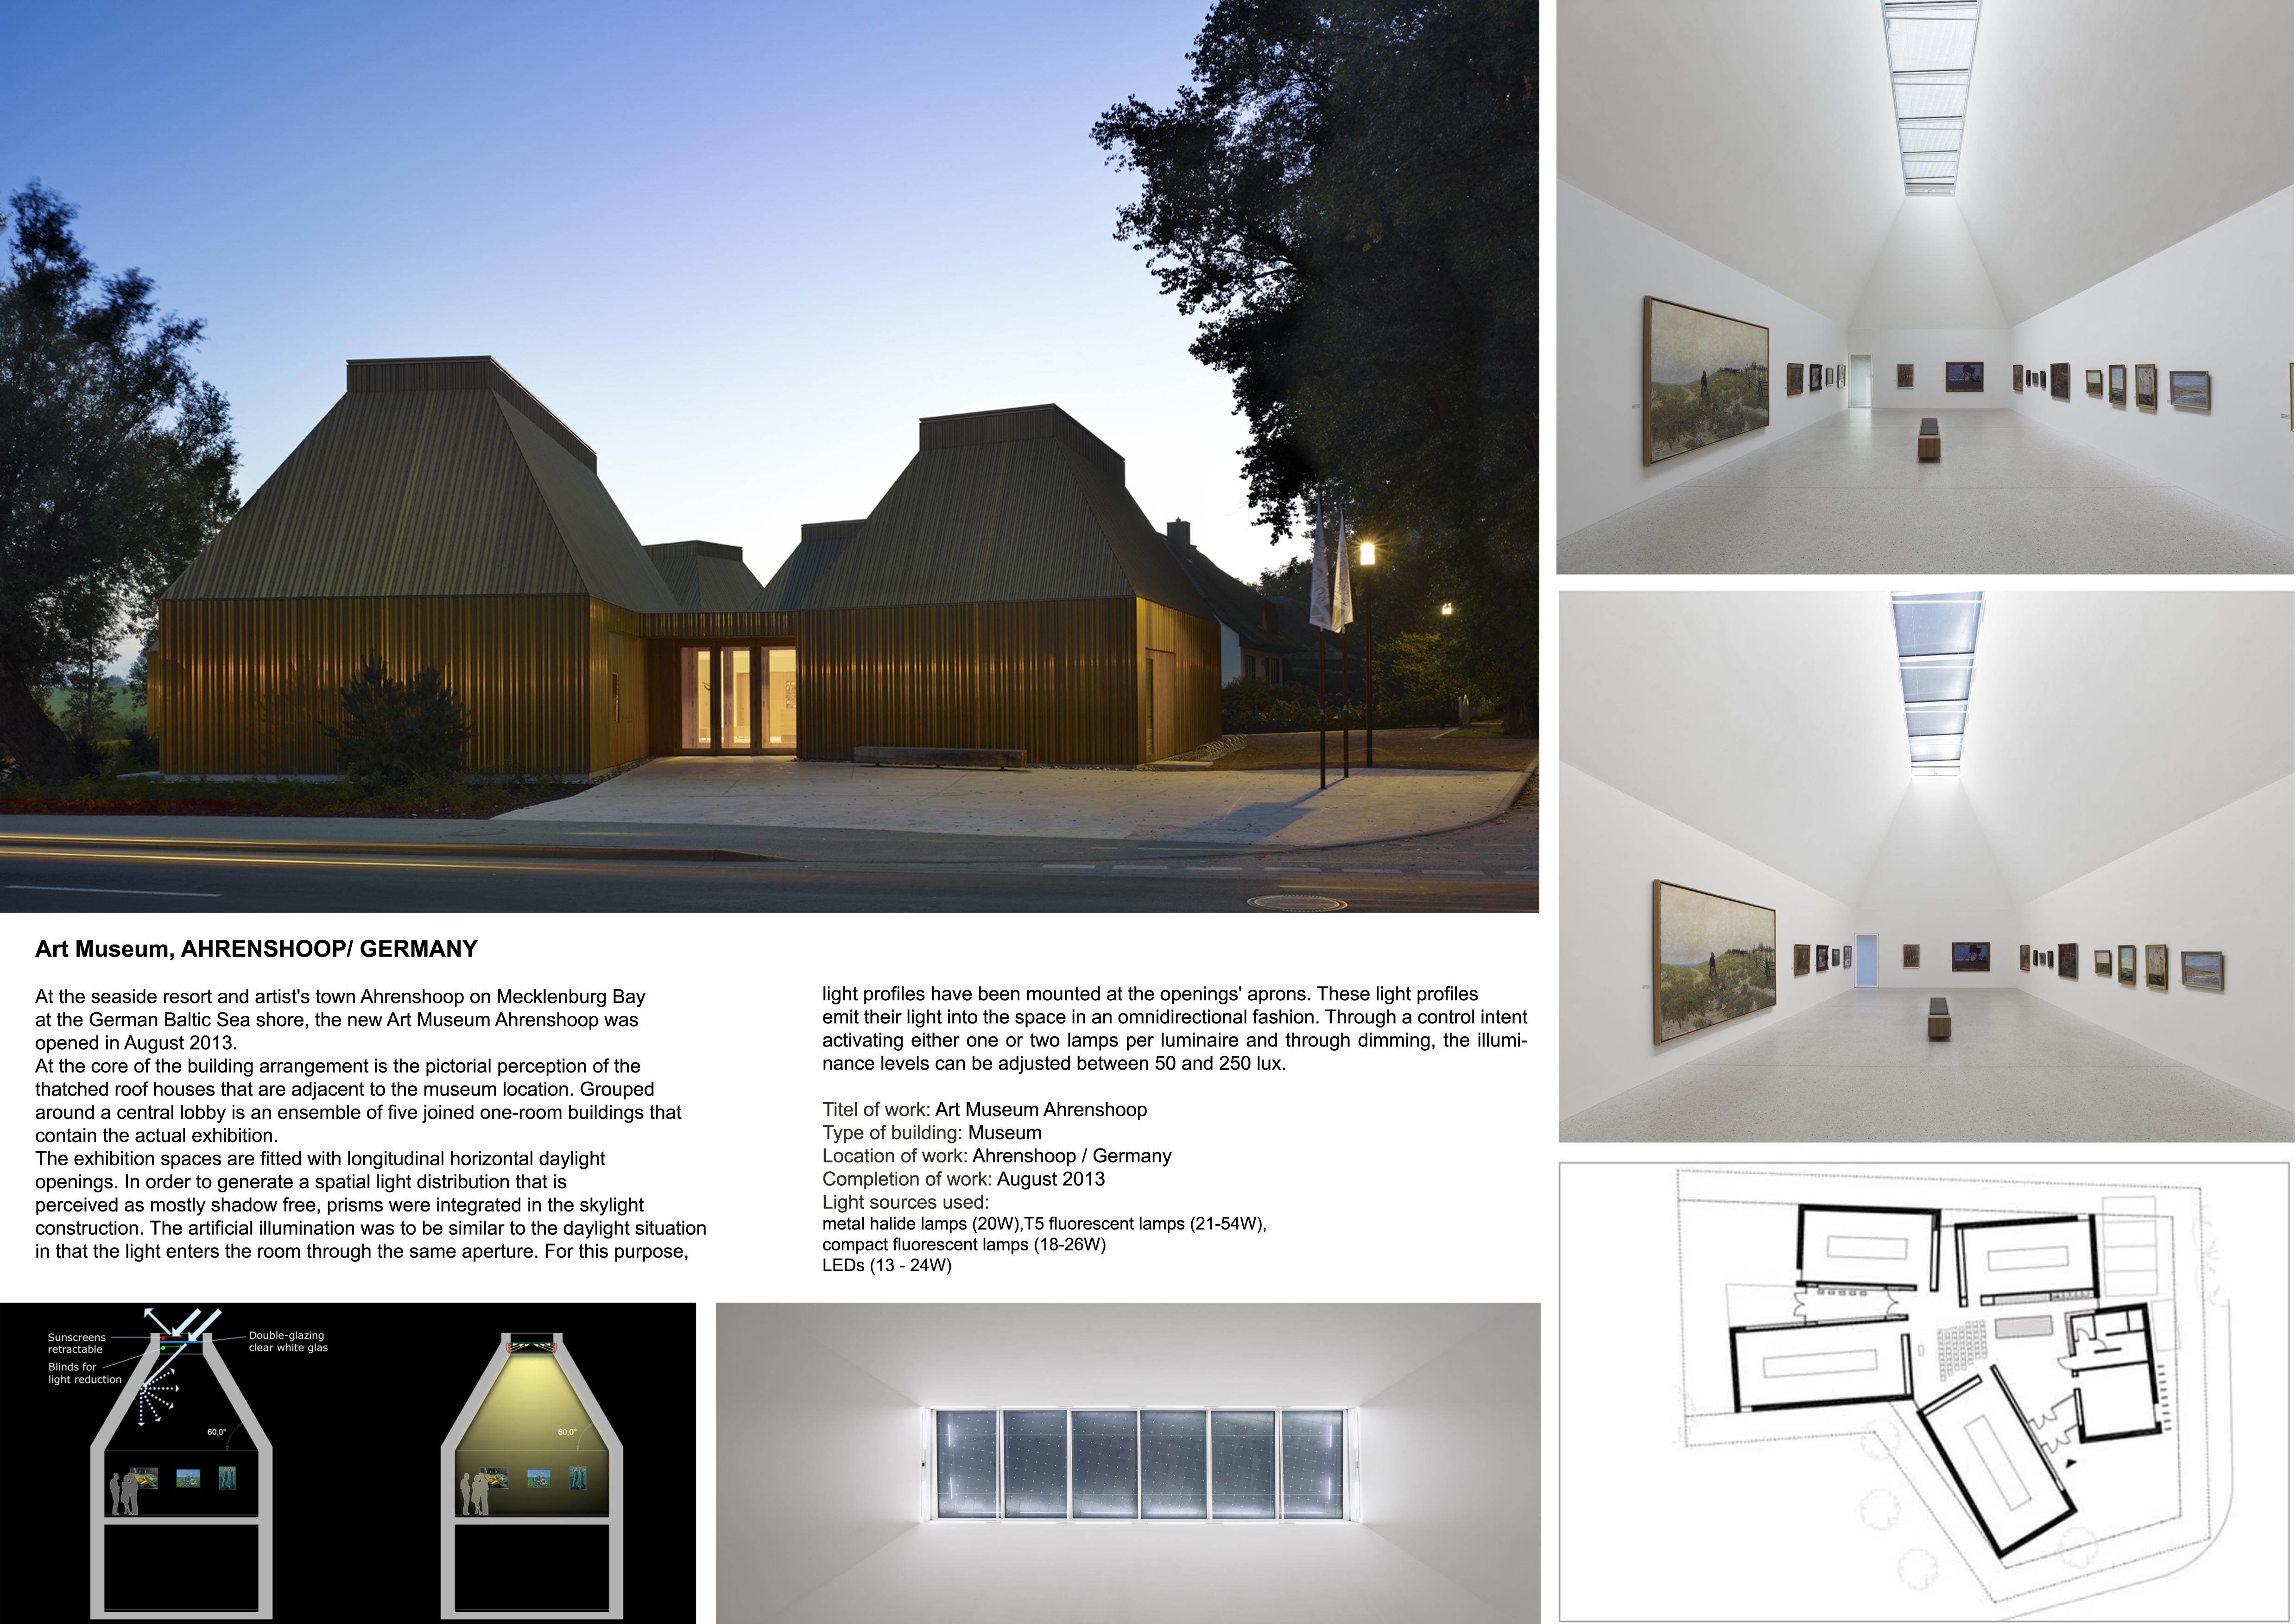 Art Museum Ahrenshoop 1